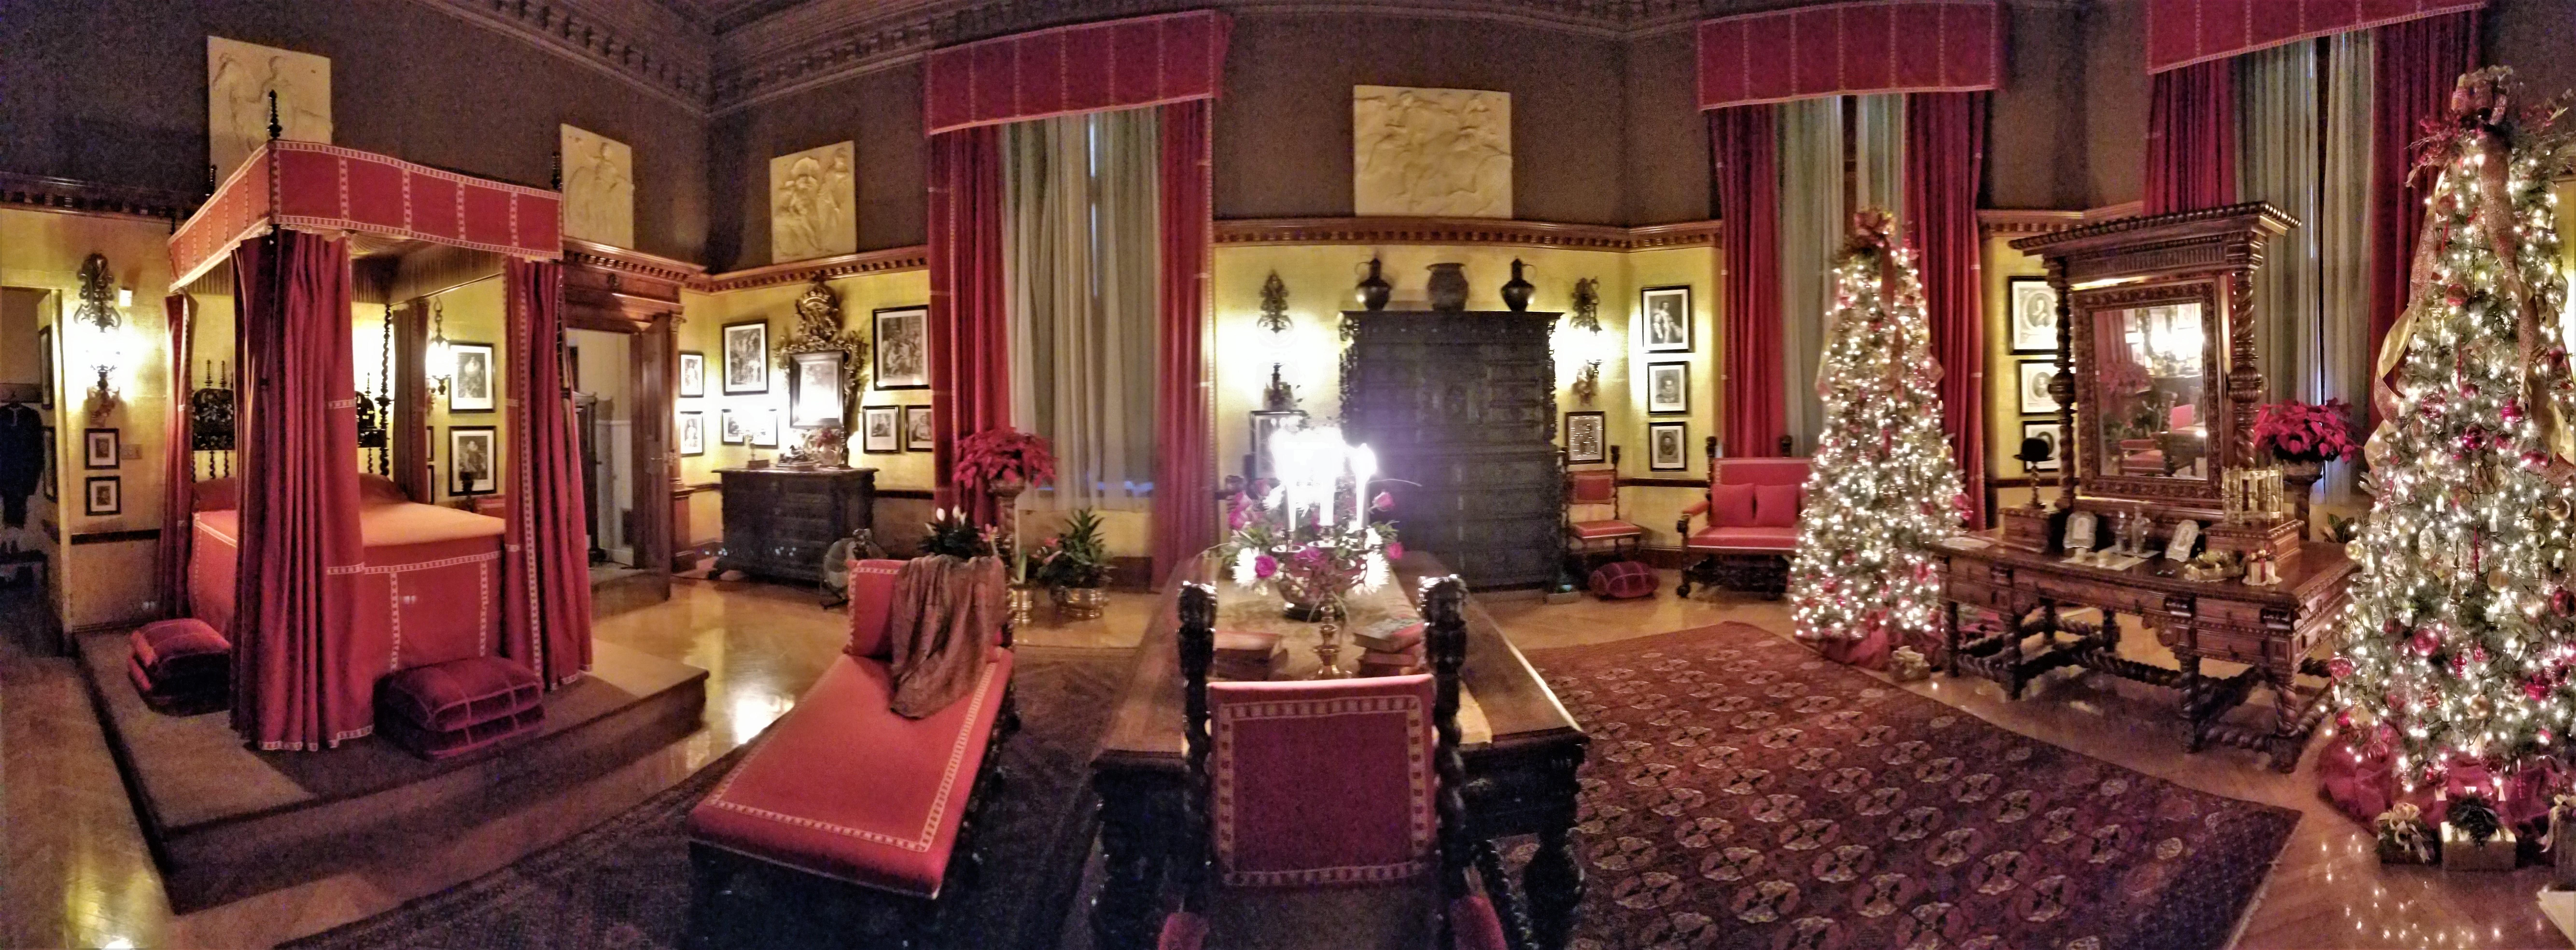 George Vanderbilt's Bedroom